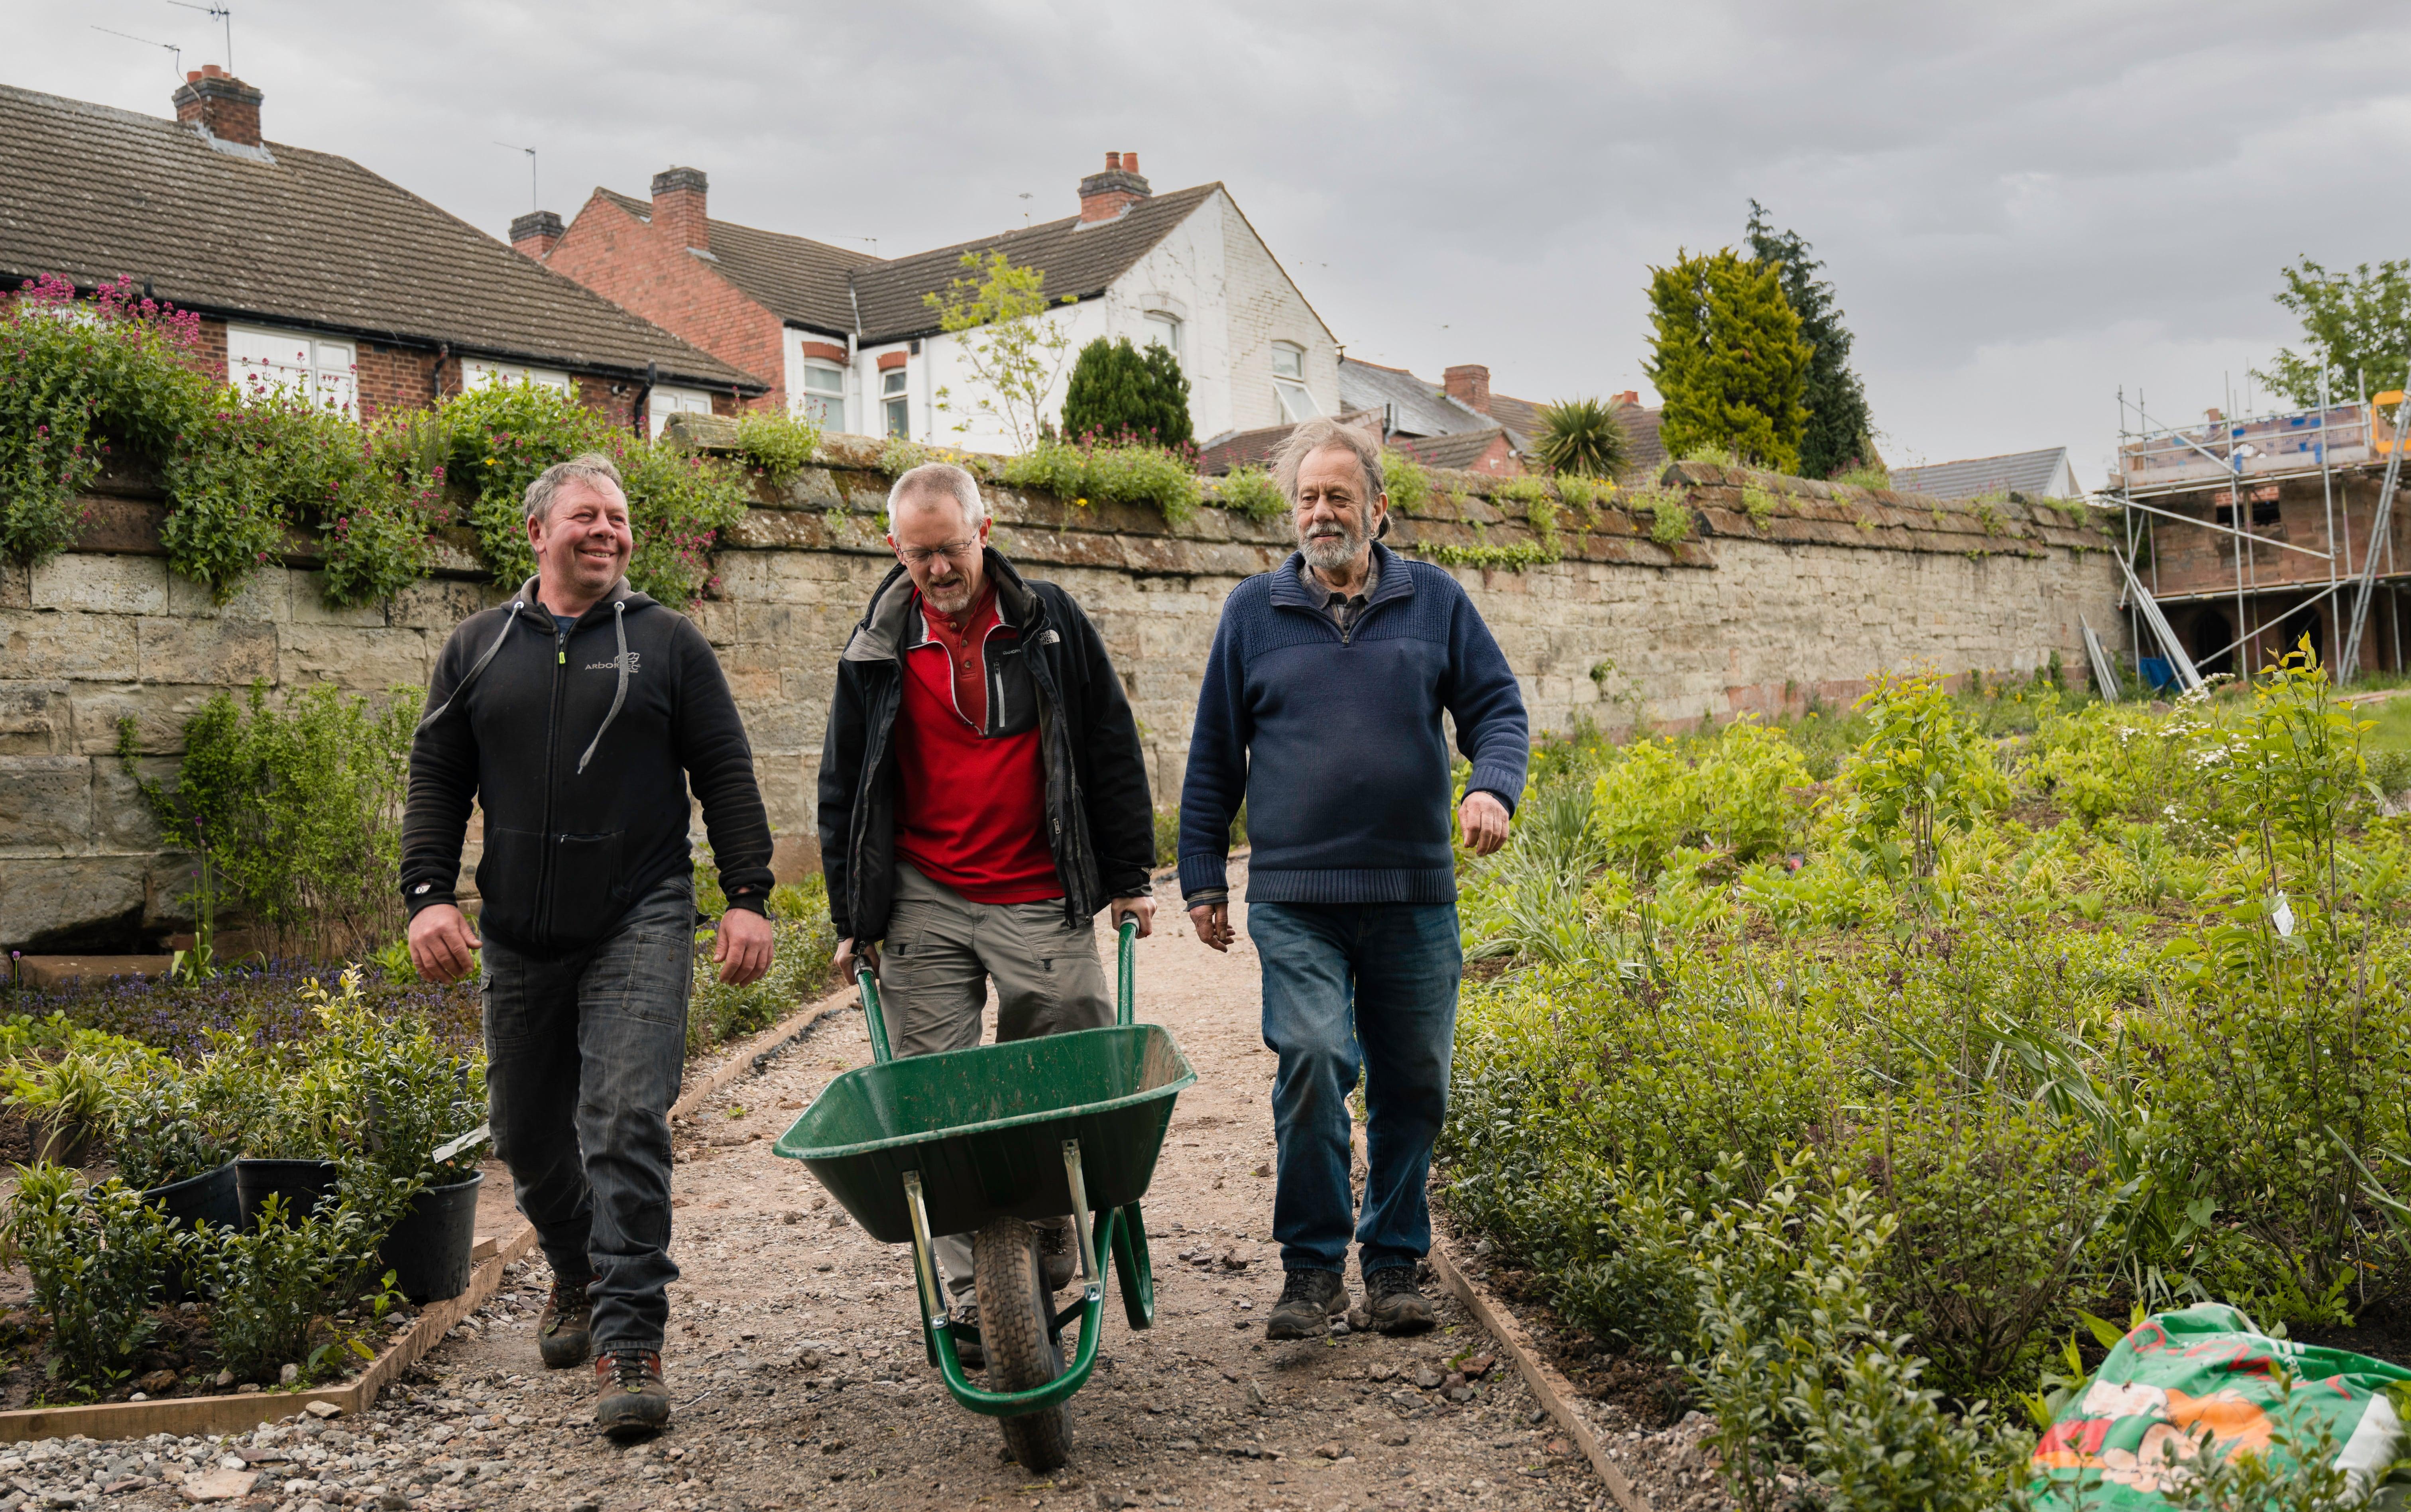 Volunteers with wheelbarrow at Charterhouse